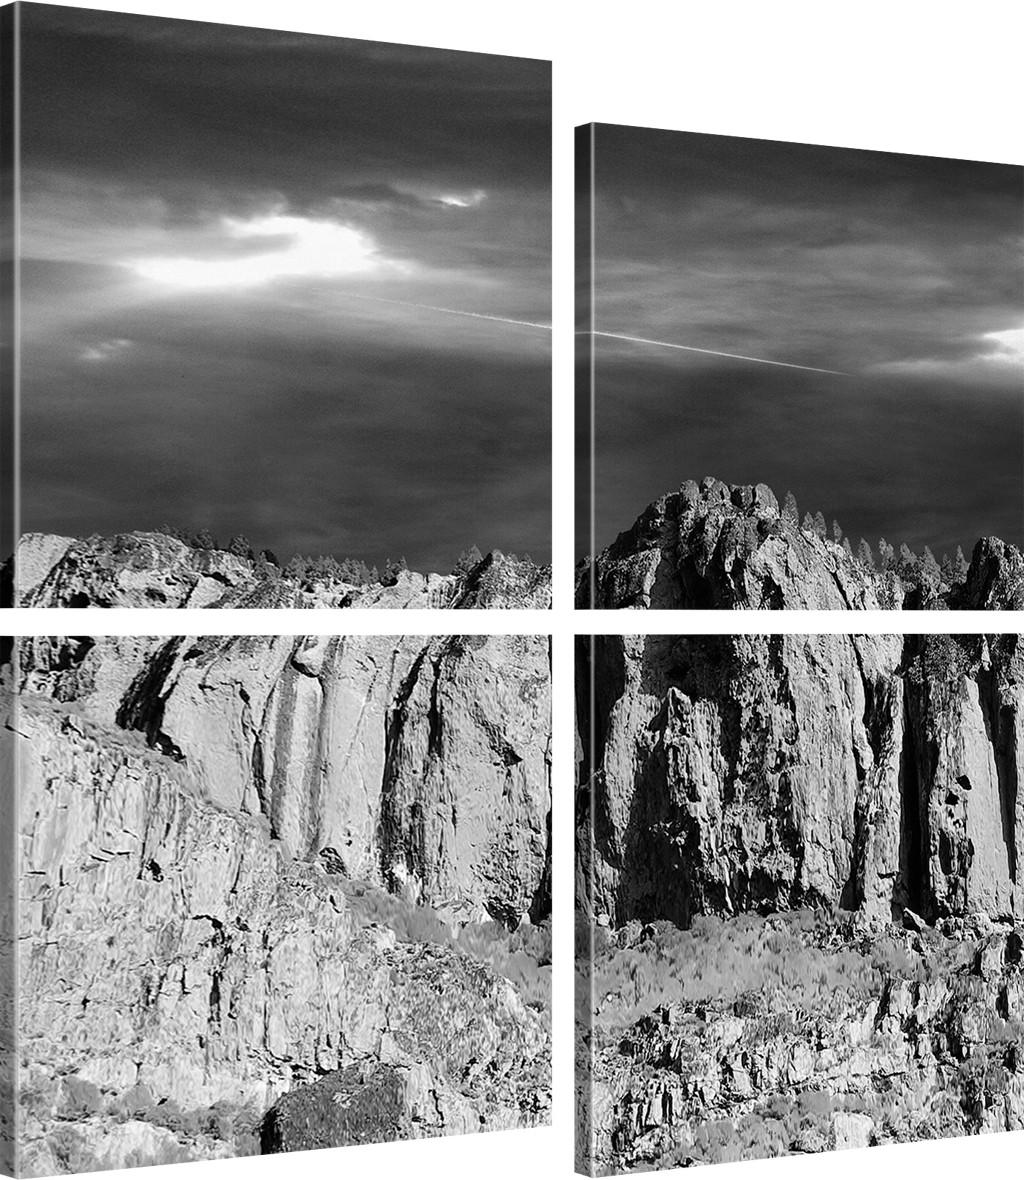 felsen landschaft bild auf leinwand leinwandbild wandbild bilder ebay. Black Bedroom Furniture Sets. Home Design Ideas